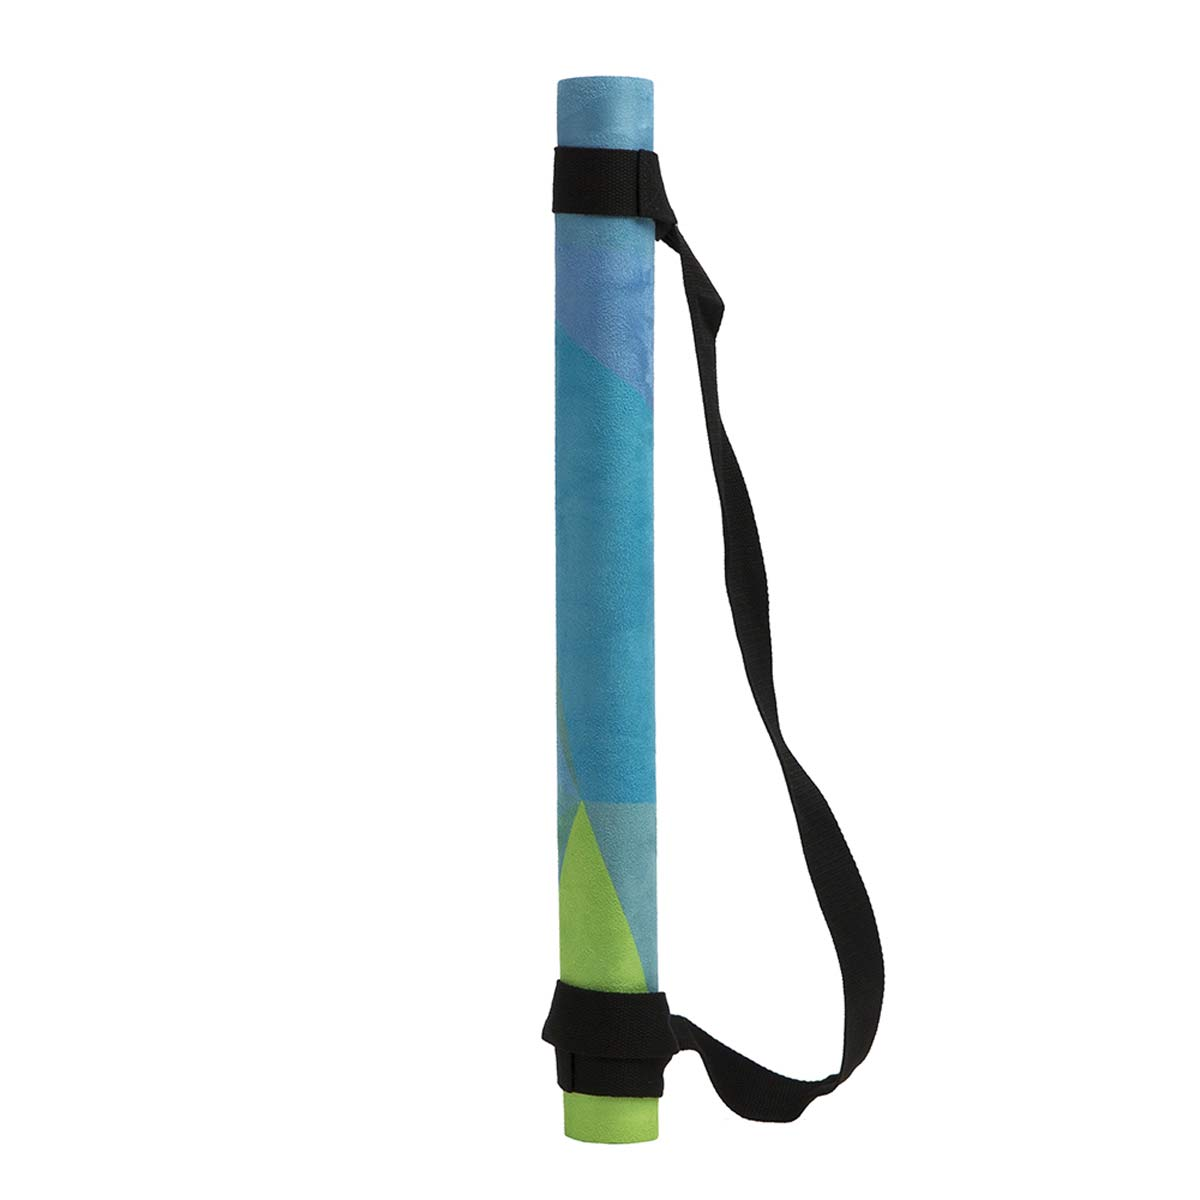 strap manduka co thunder mercantile go yoga products play goplay mat sling jax